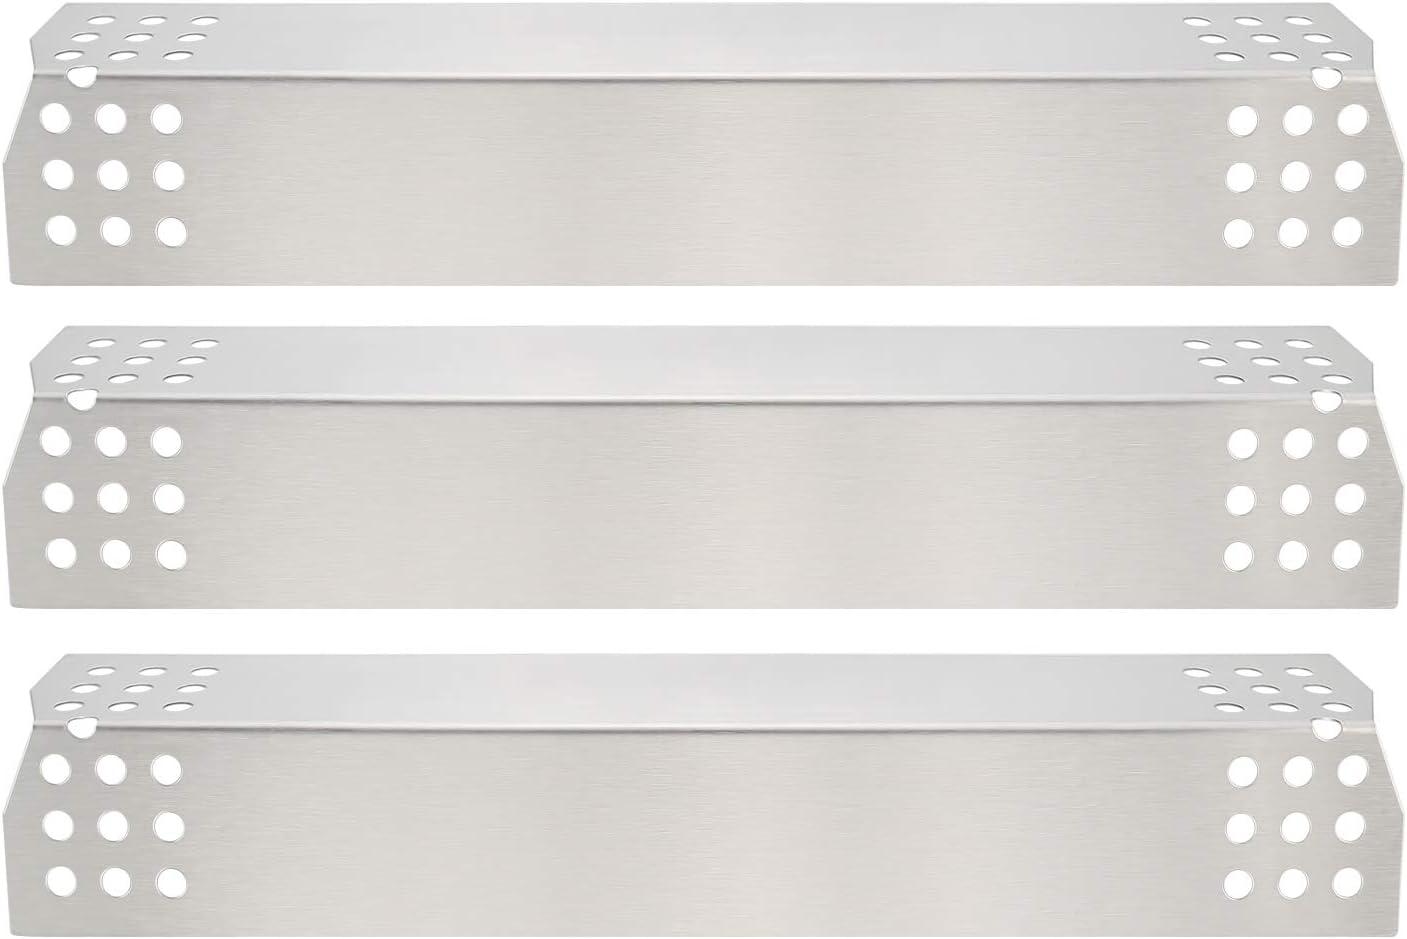 GFTIME Gas BBQ 36.98 x 8.57cm Repuestos de Placa de Calor de Acero Inoxidable para Nexgrill 720-0783E 720-0830H 720-0896 720-0896B 720-0898 720 0896C, Grillmaster 720-0697 BBQ Grill (3pack)